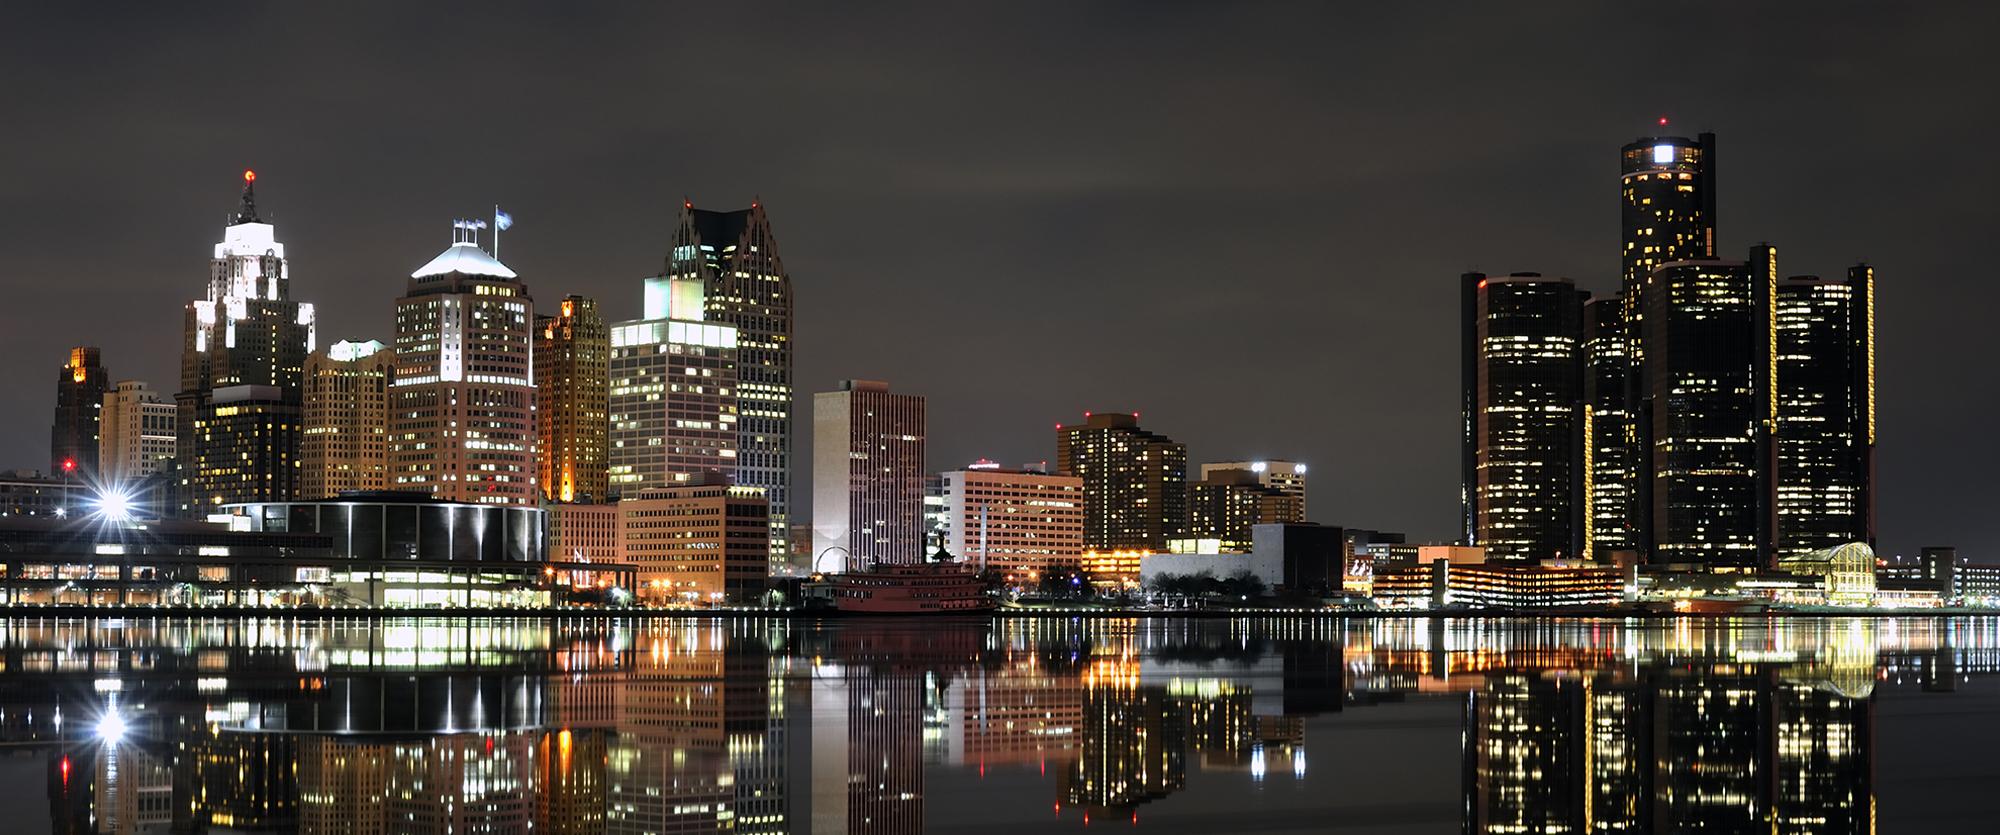 Outstanding Felony Warrant in the City of Detroit?